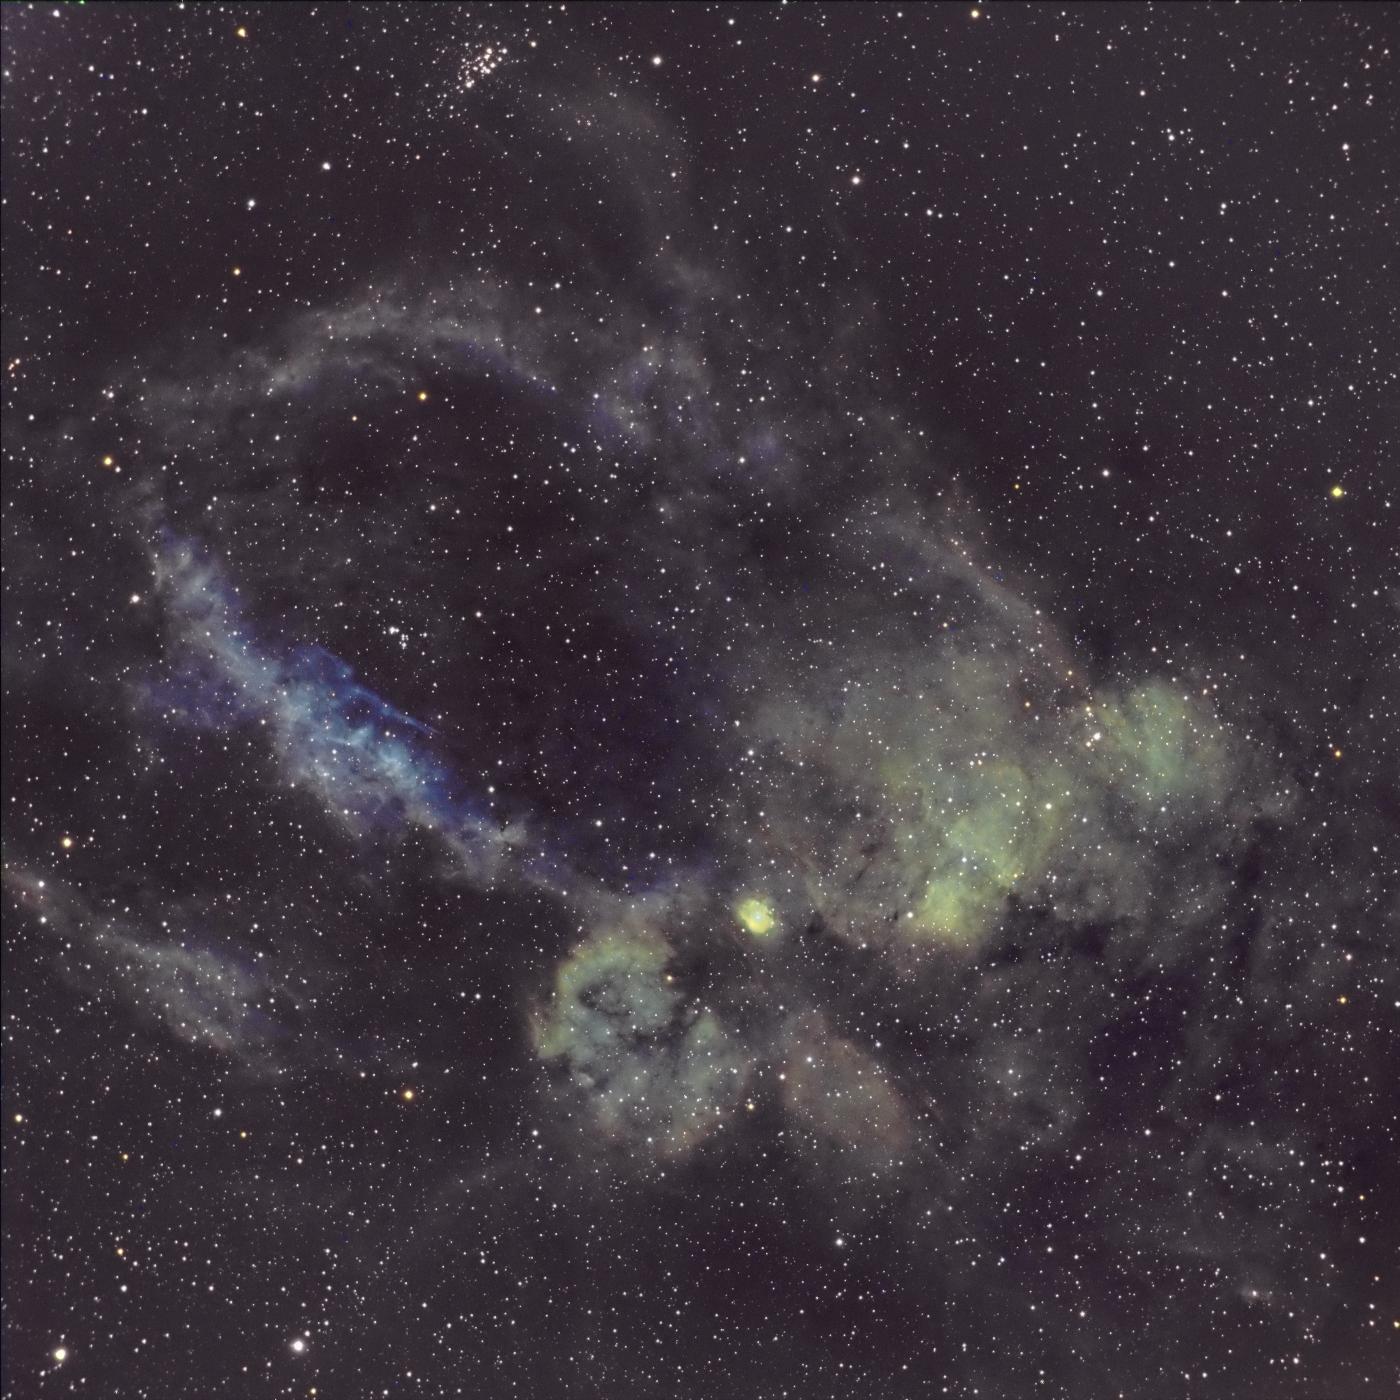 La nébuleuse Sh2 157